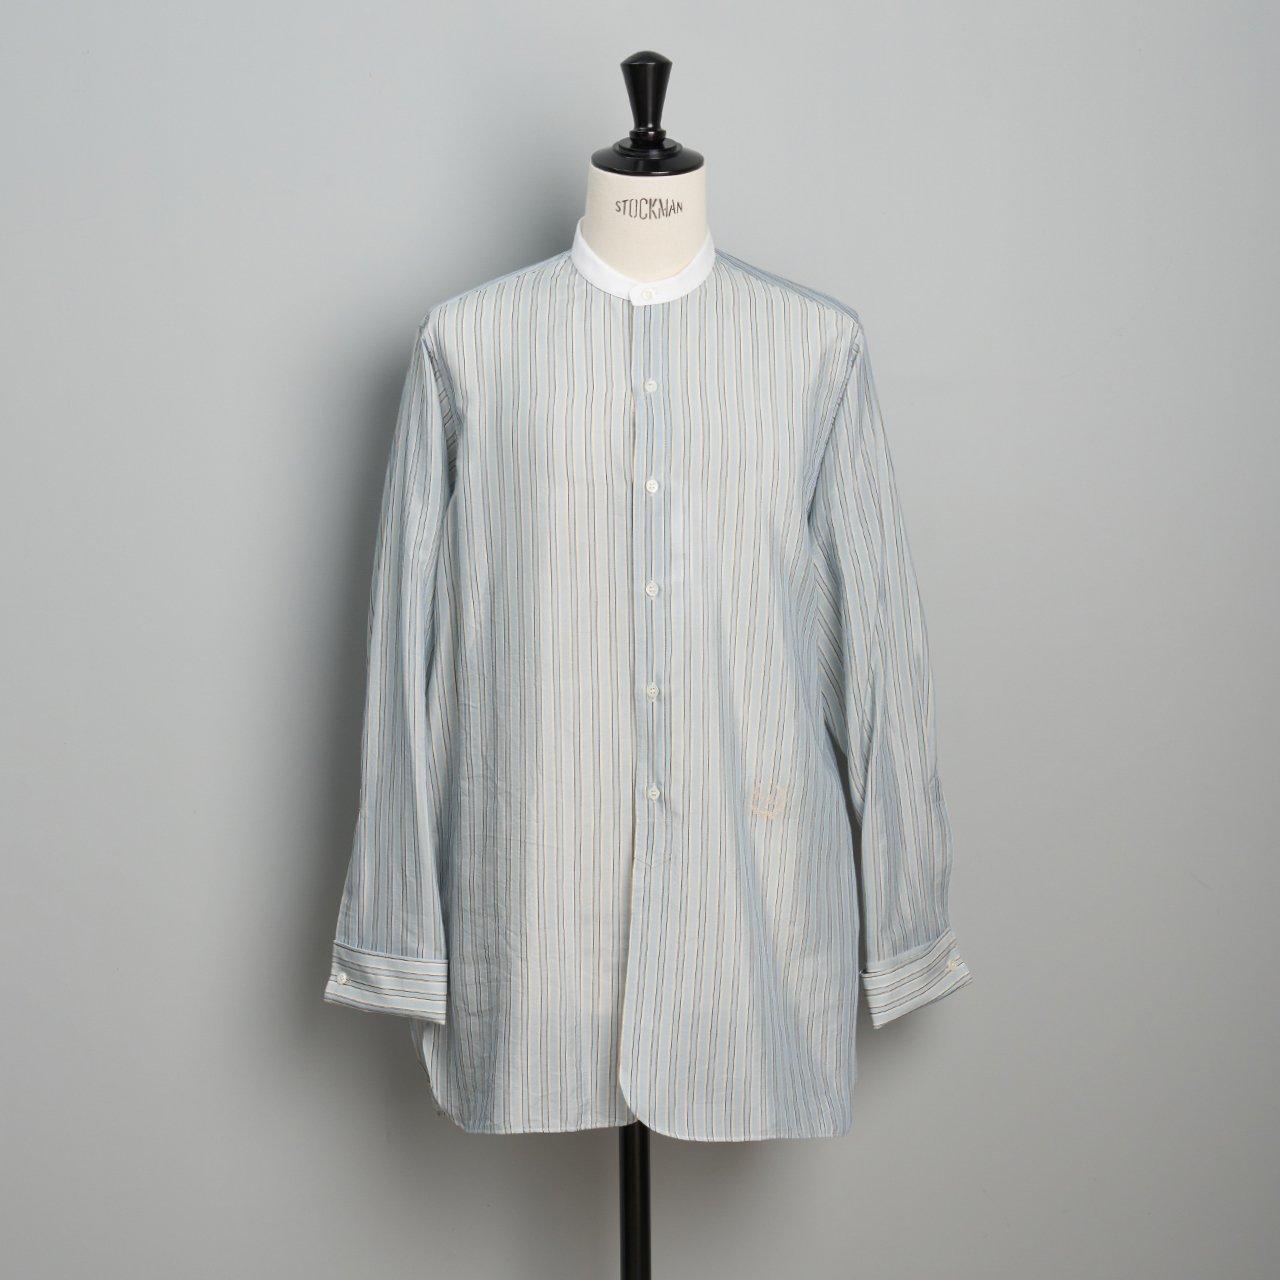 Maison Margiela PARIS <BR>ノーカラーシャツ<BR>ブルーストライプ